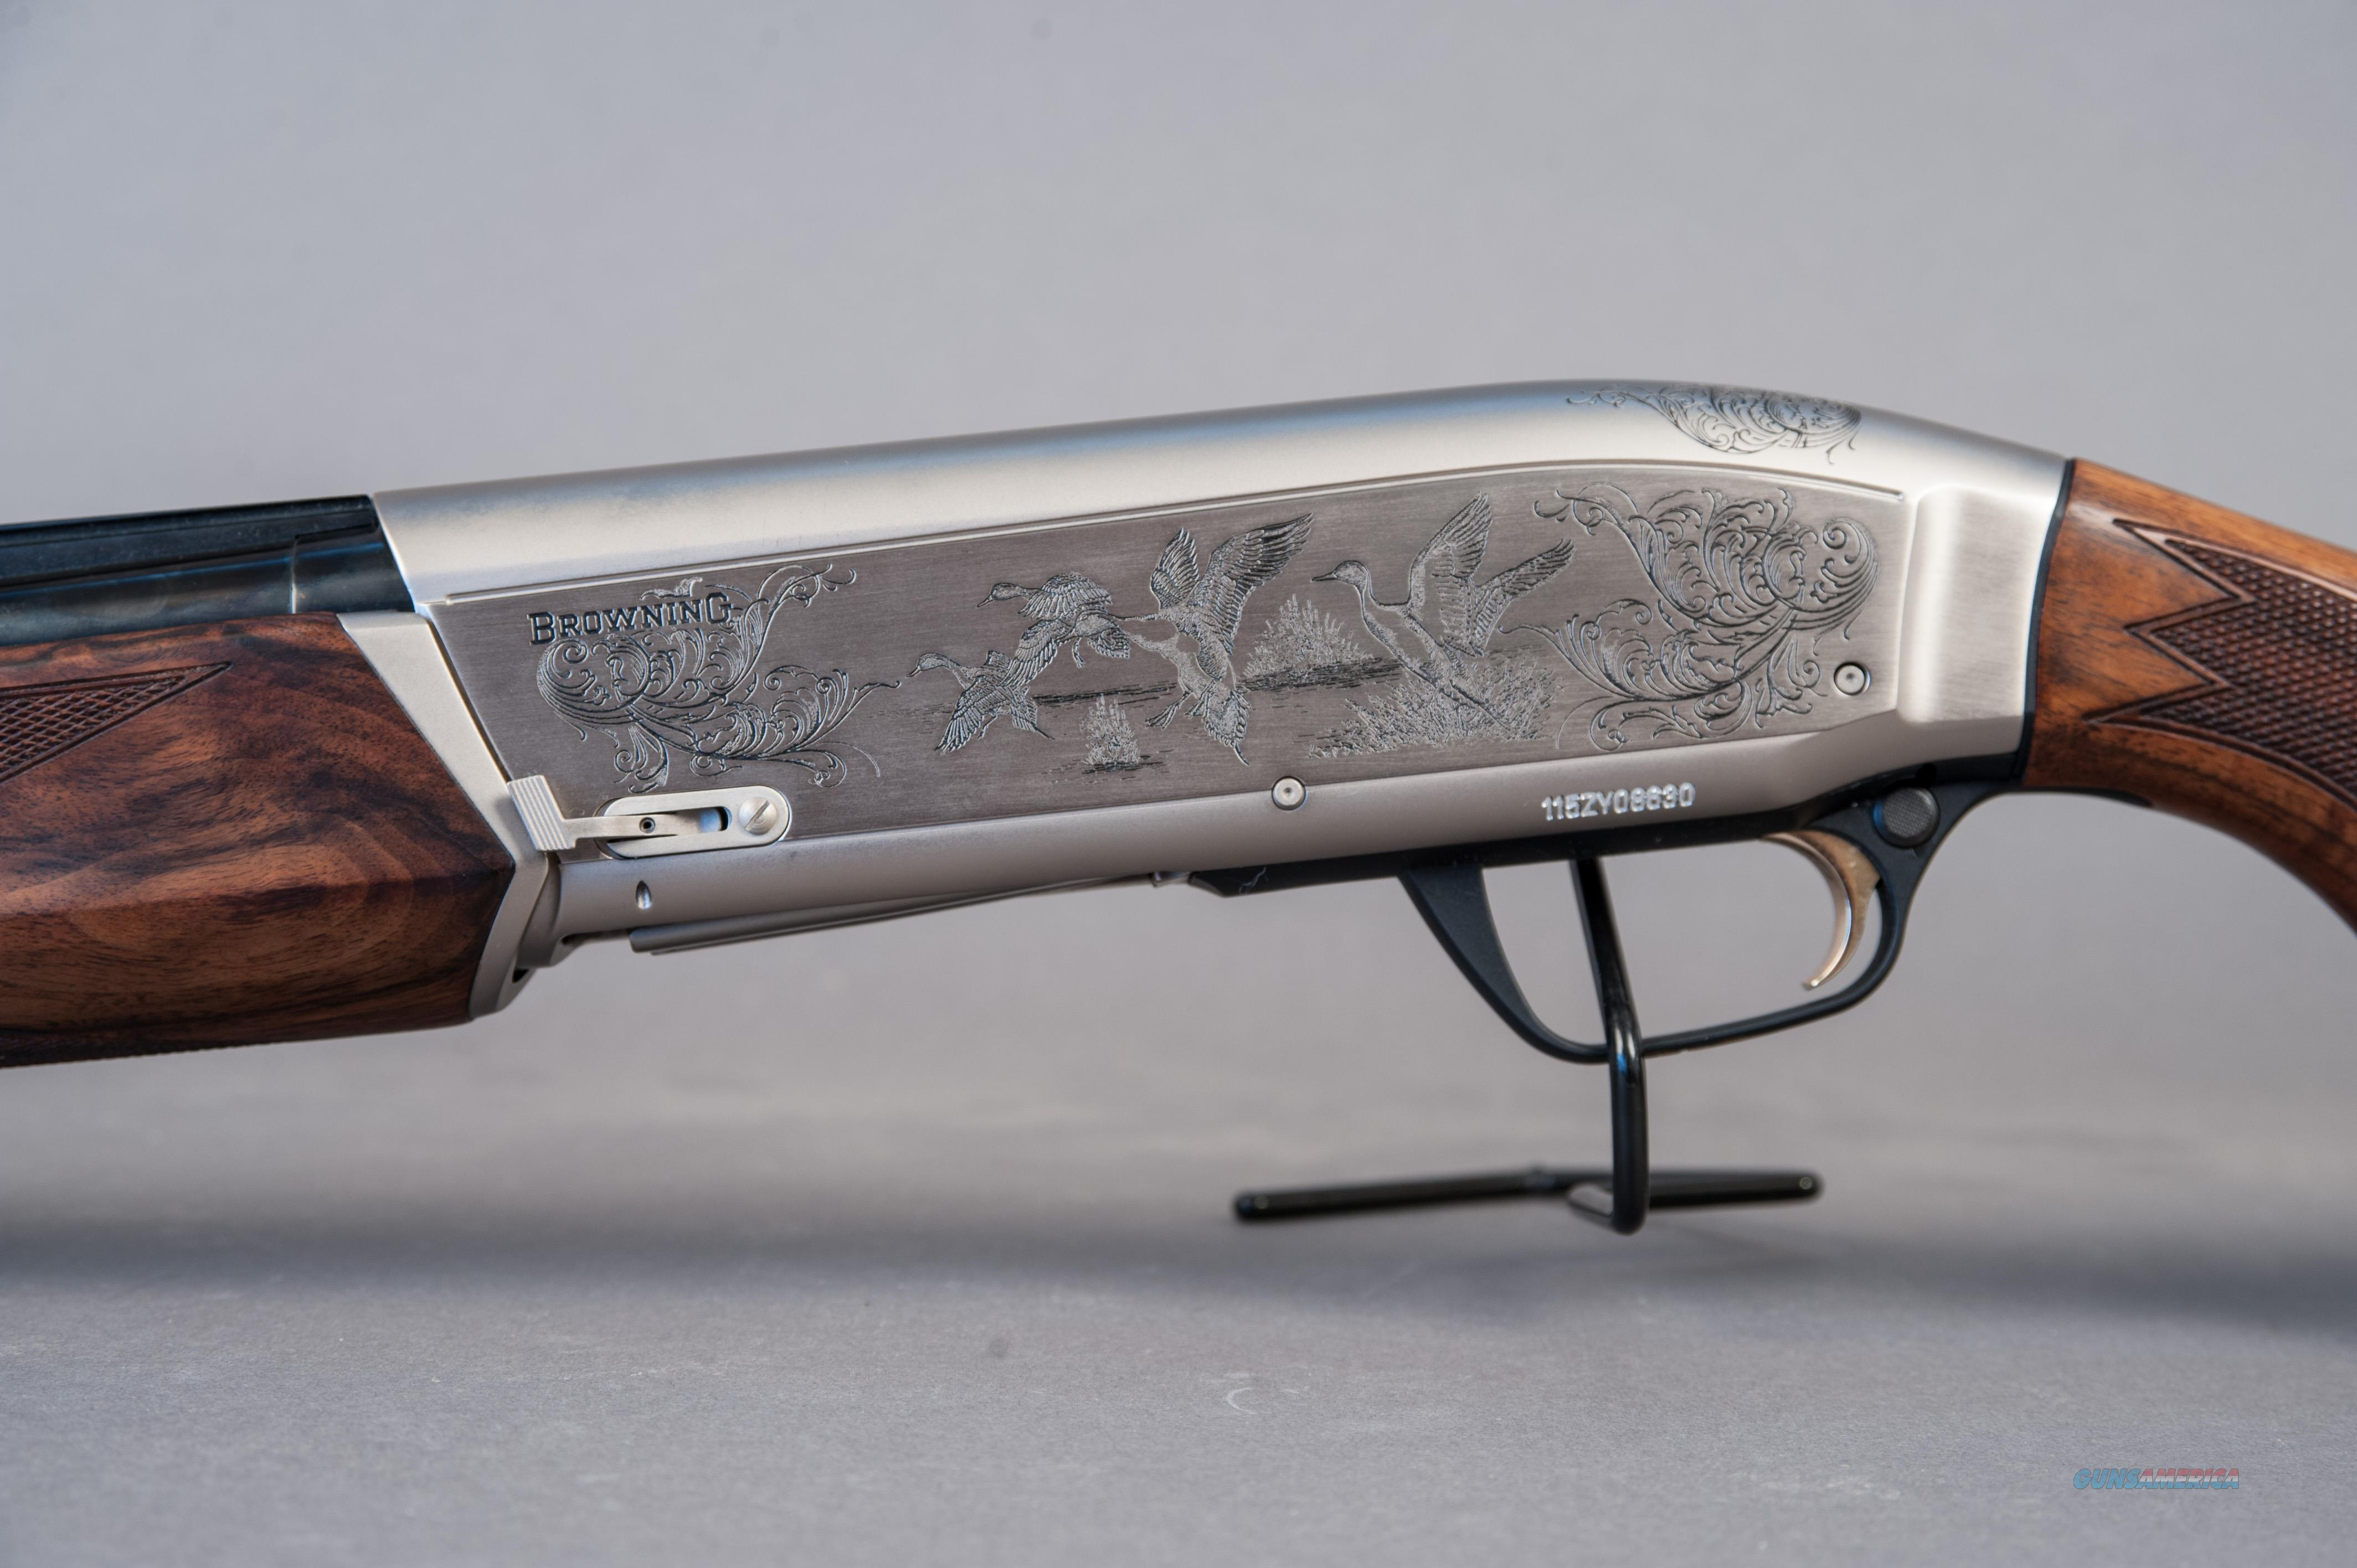 Browning Maxus Ultimate 12ga 30 Barrel Shotgun For Sale